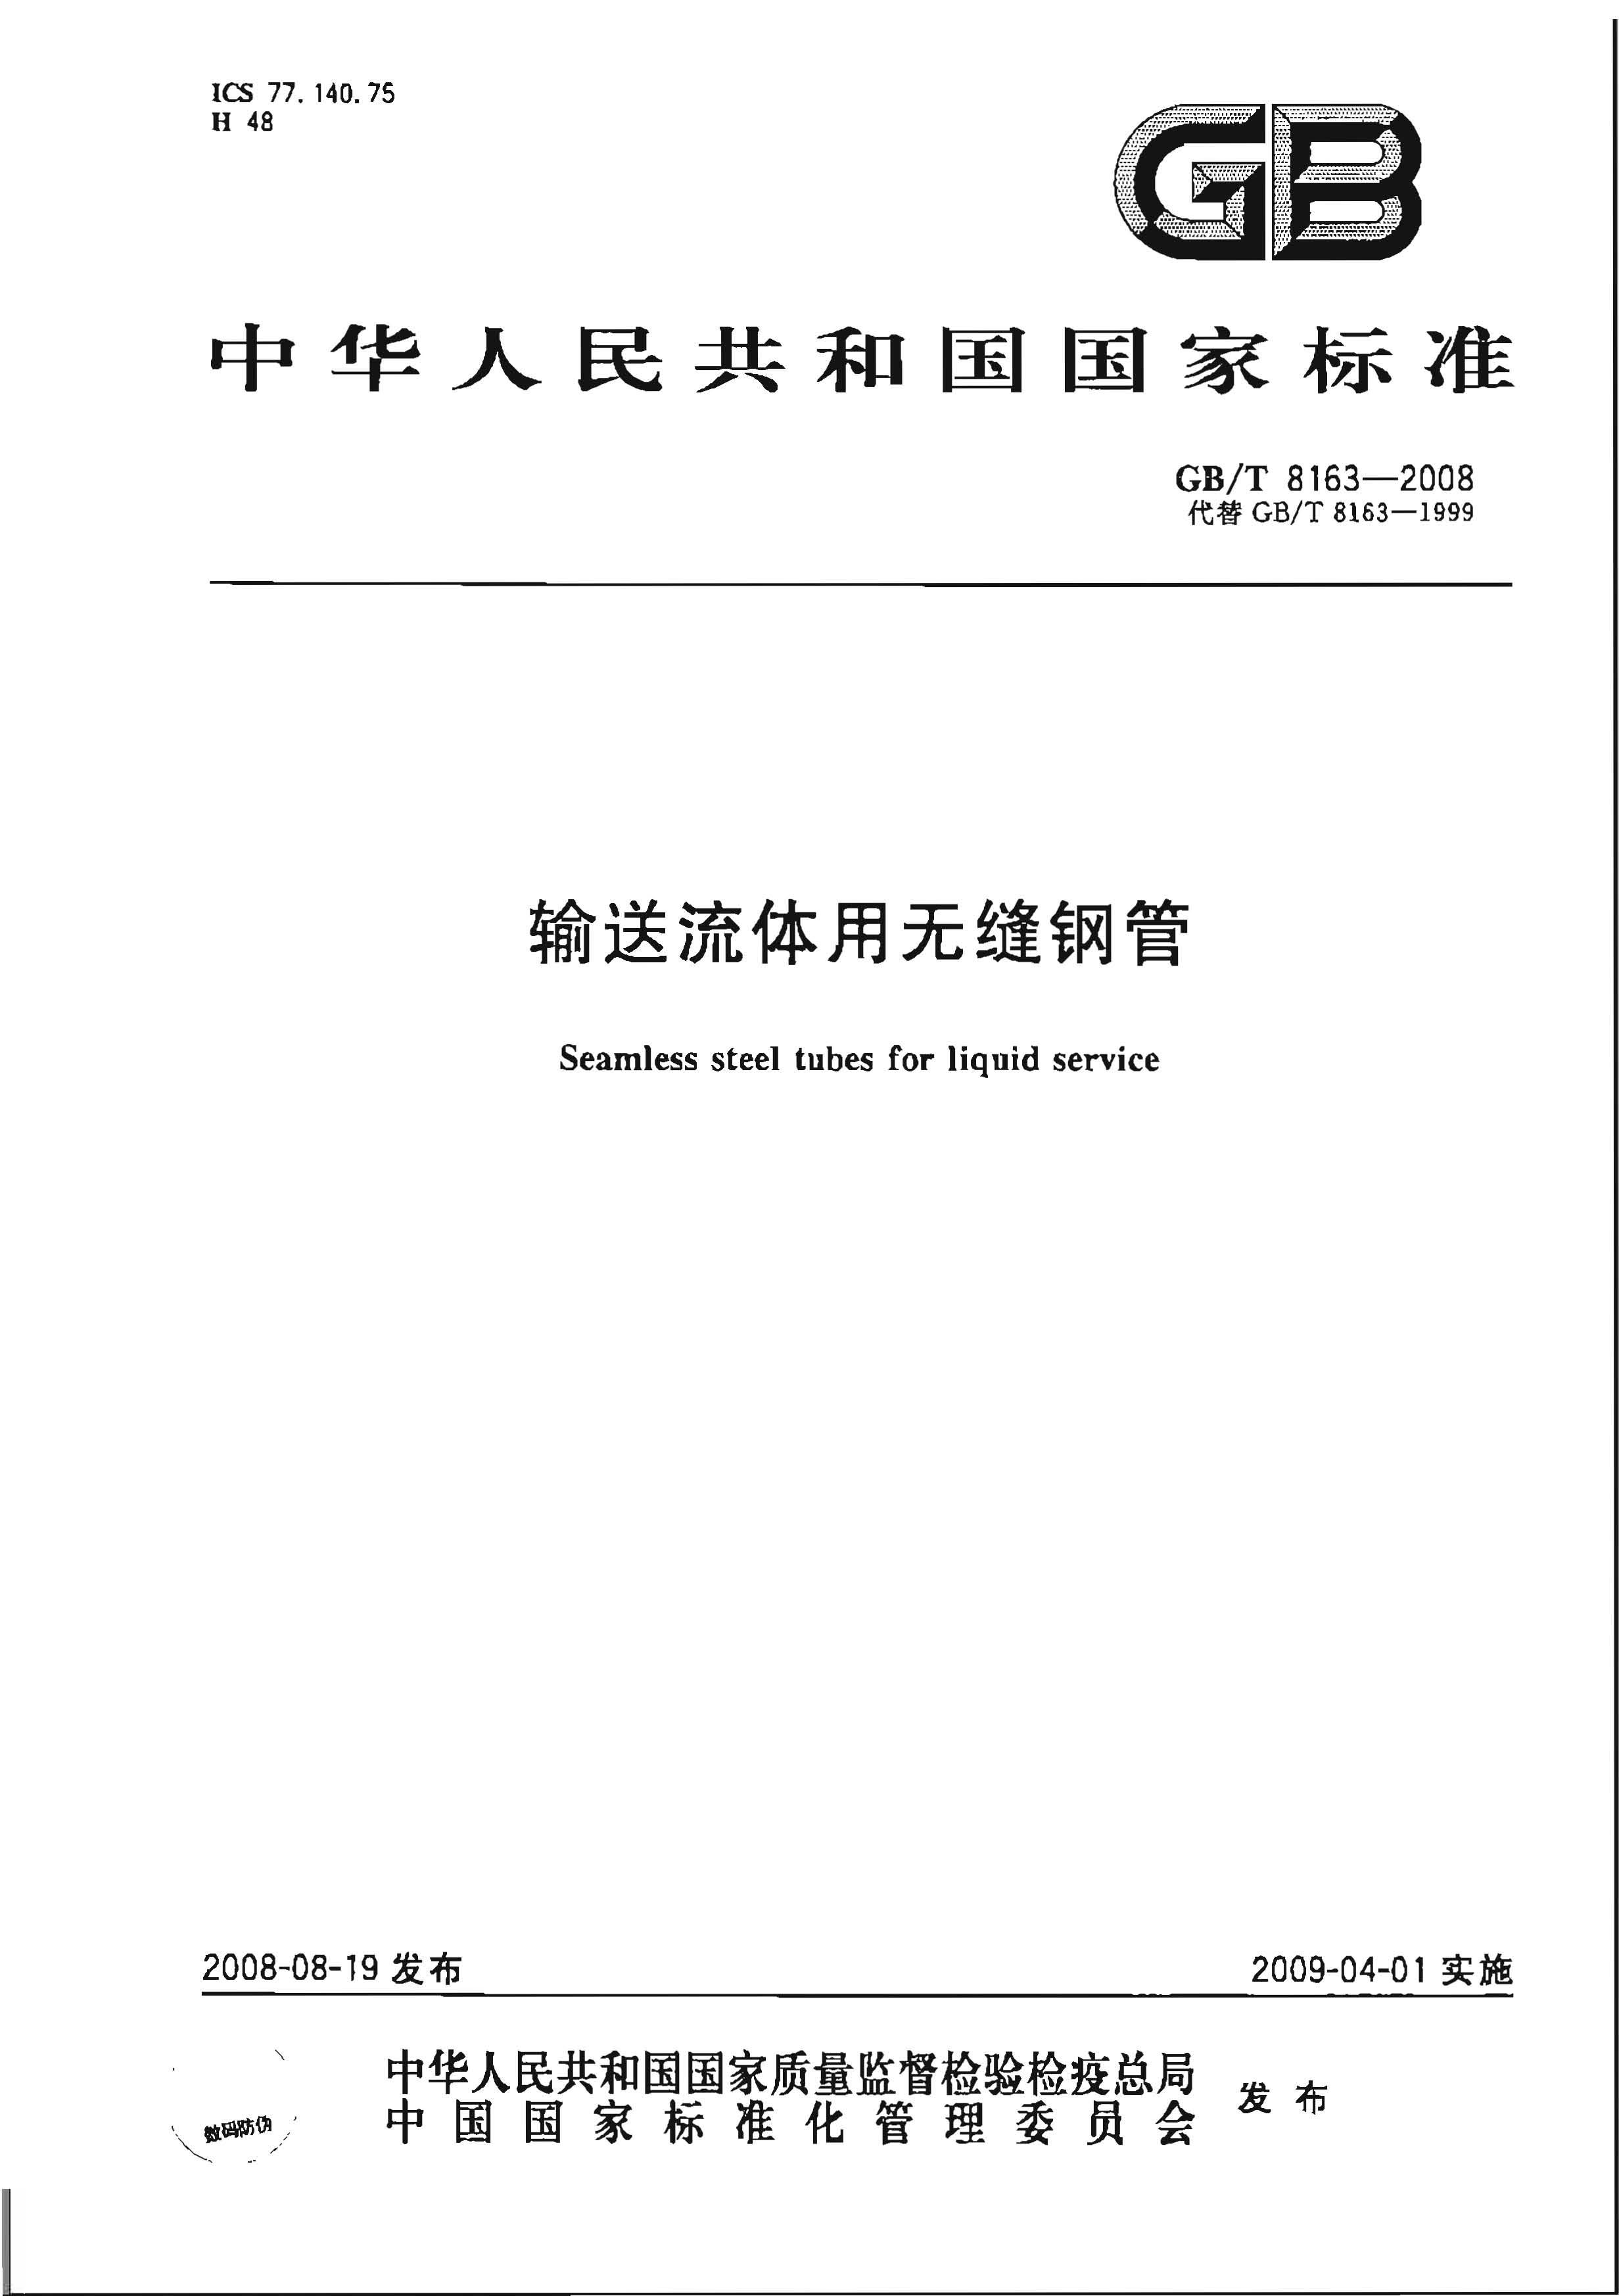 GB/T 8163-2008标准下载